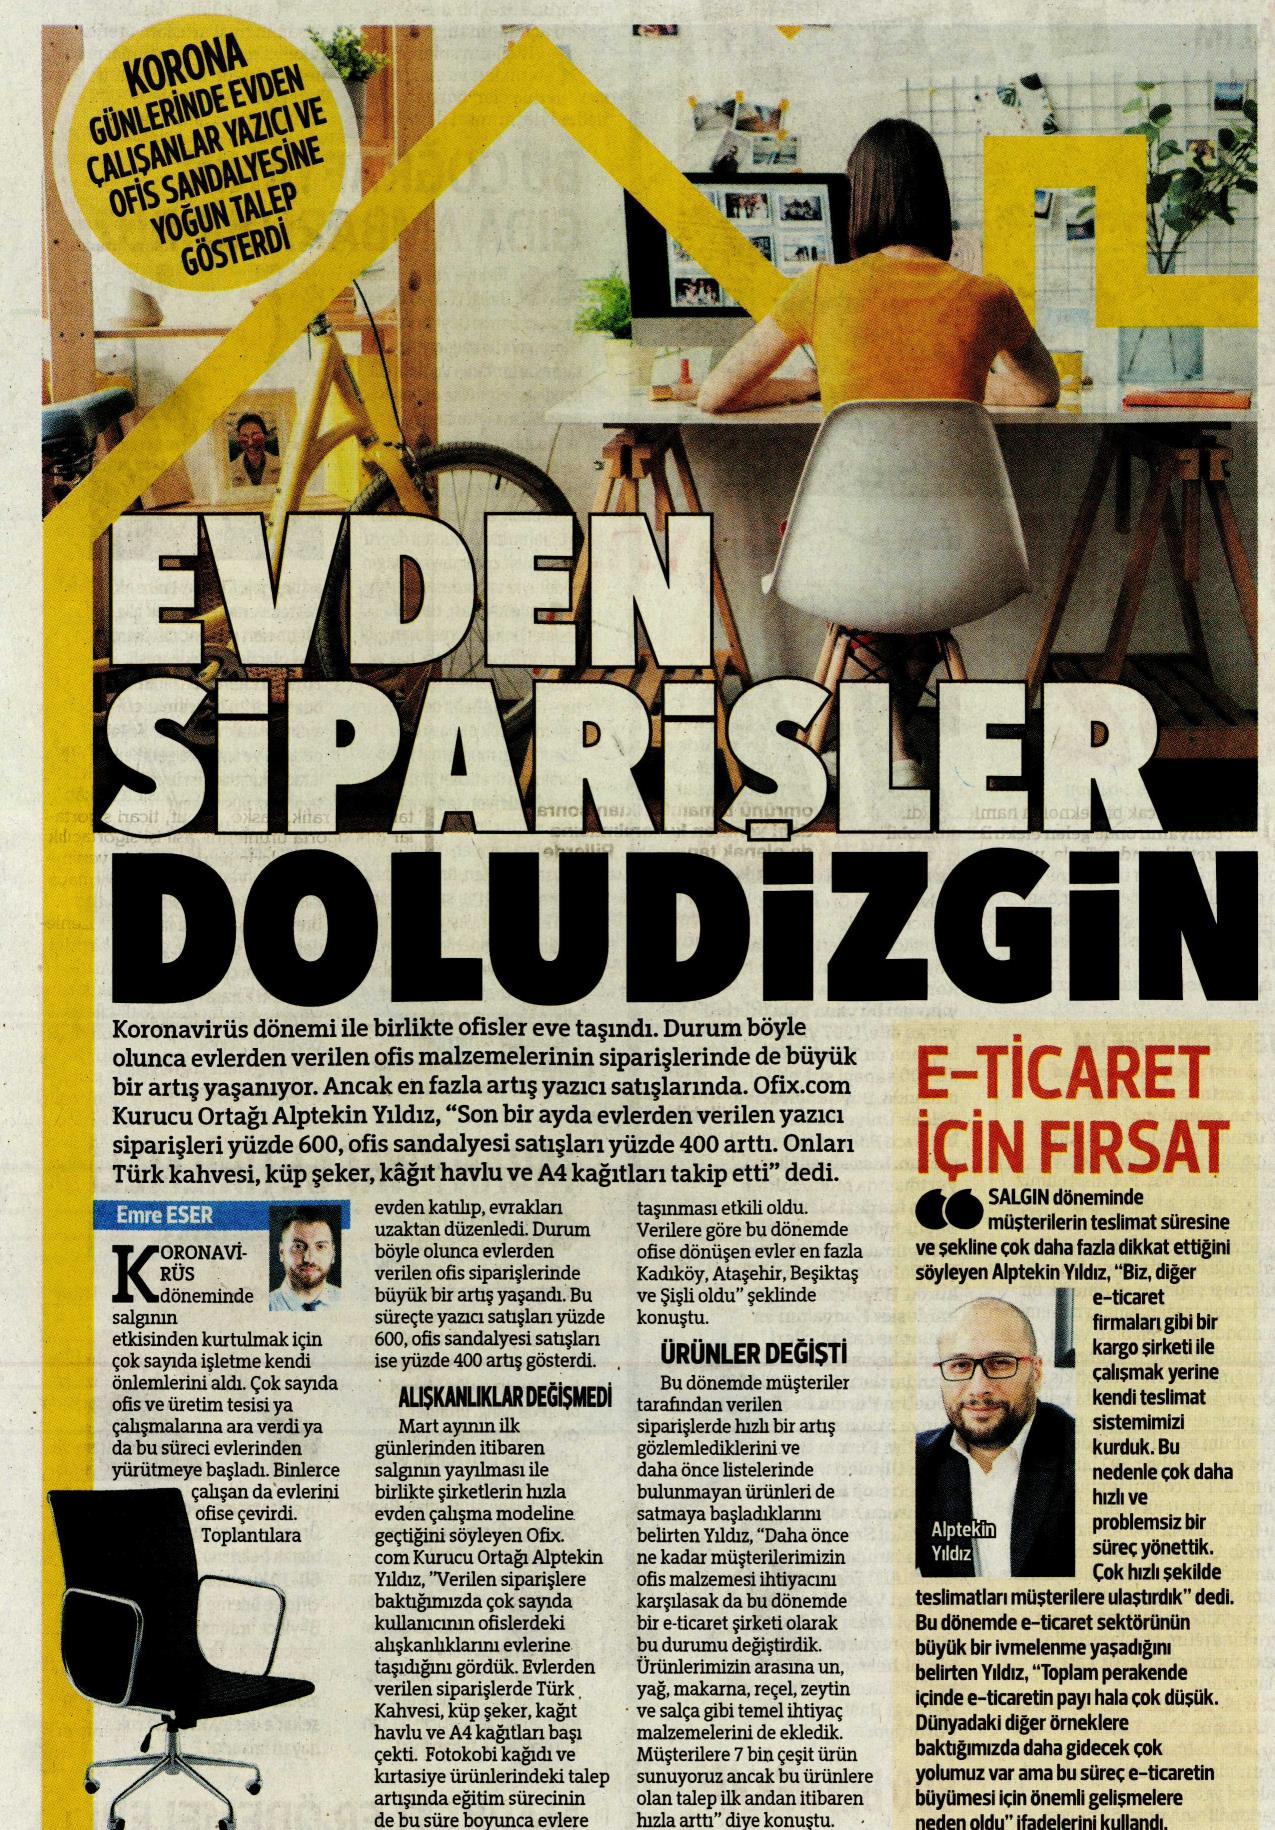 HÜRRİYET / OFİX.COM